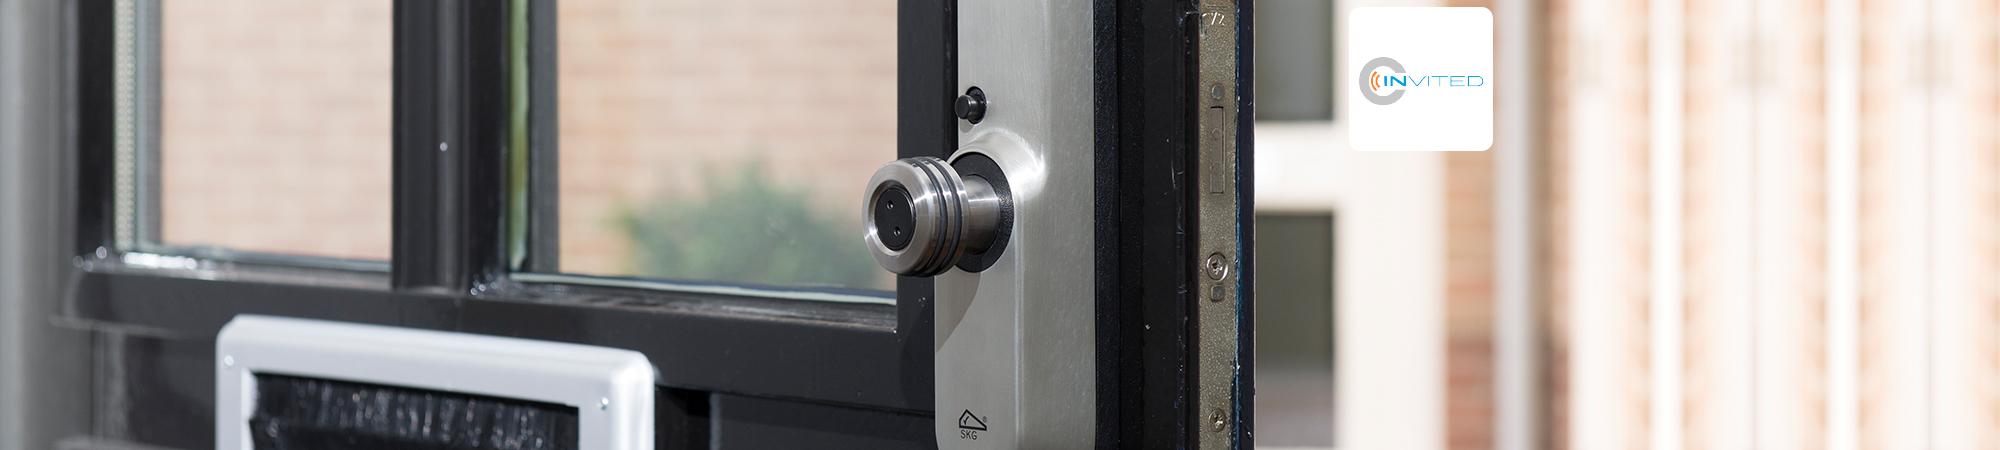 Elektronisch Deurslot Invited Smart Lock op voordeur